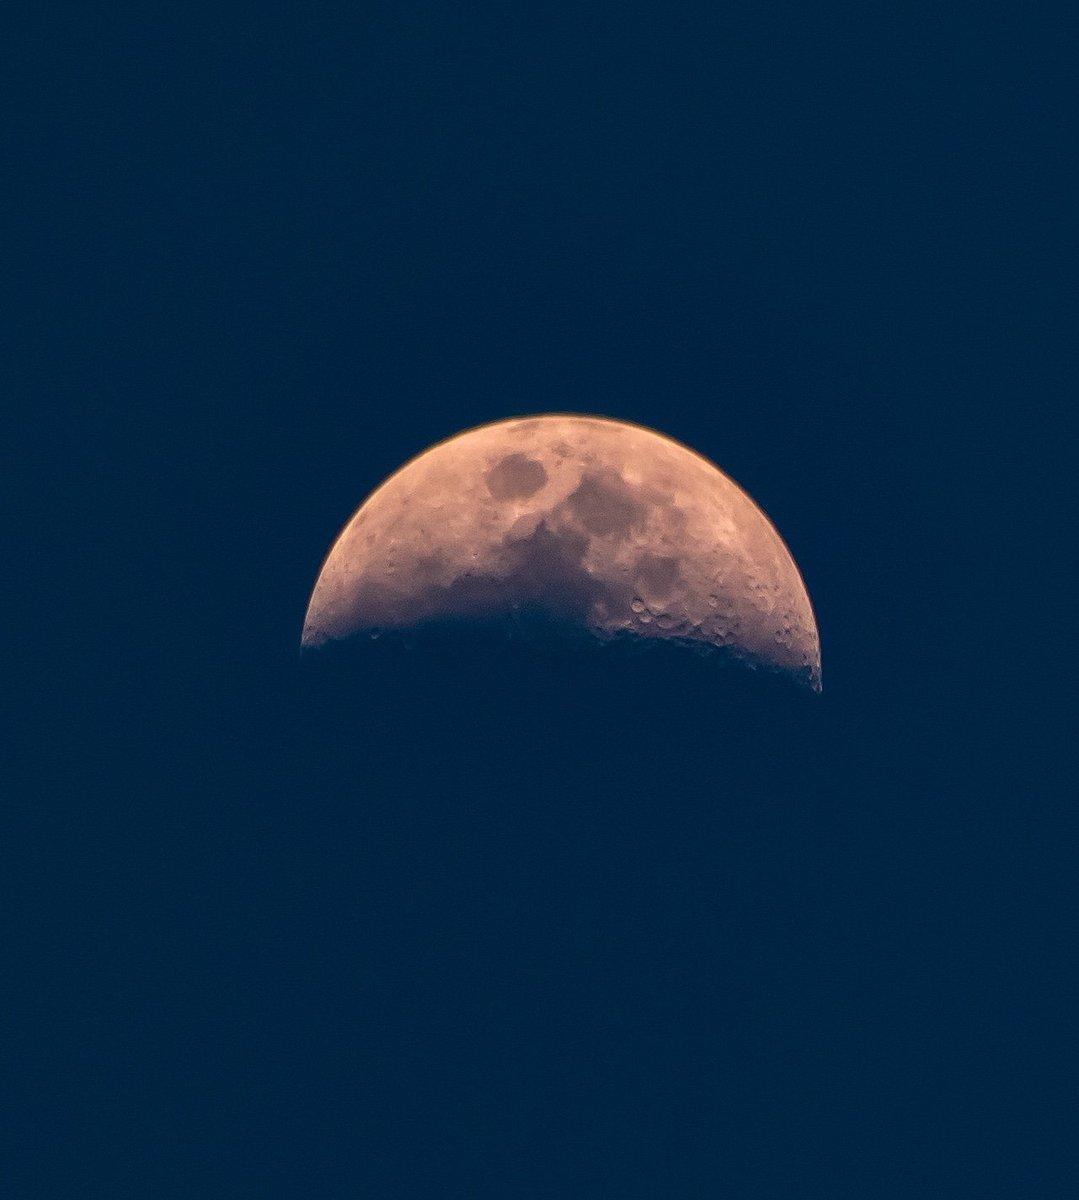 Blue sky moon tonight #moonphases #waxingcrescentmoon #canont7i #observethemoon #skywatcher #weather #astrophotography #themoontonight #luna #autumn #octobermoons #autumnmoons #octobernights #autumnnights #autumnsky #naturewalks #naturetherapy https://t.co/EqN7Hig74v